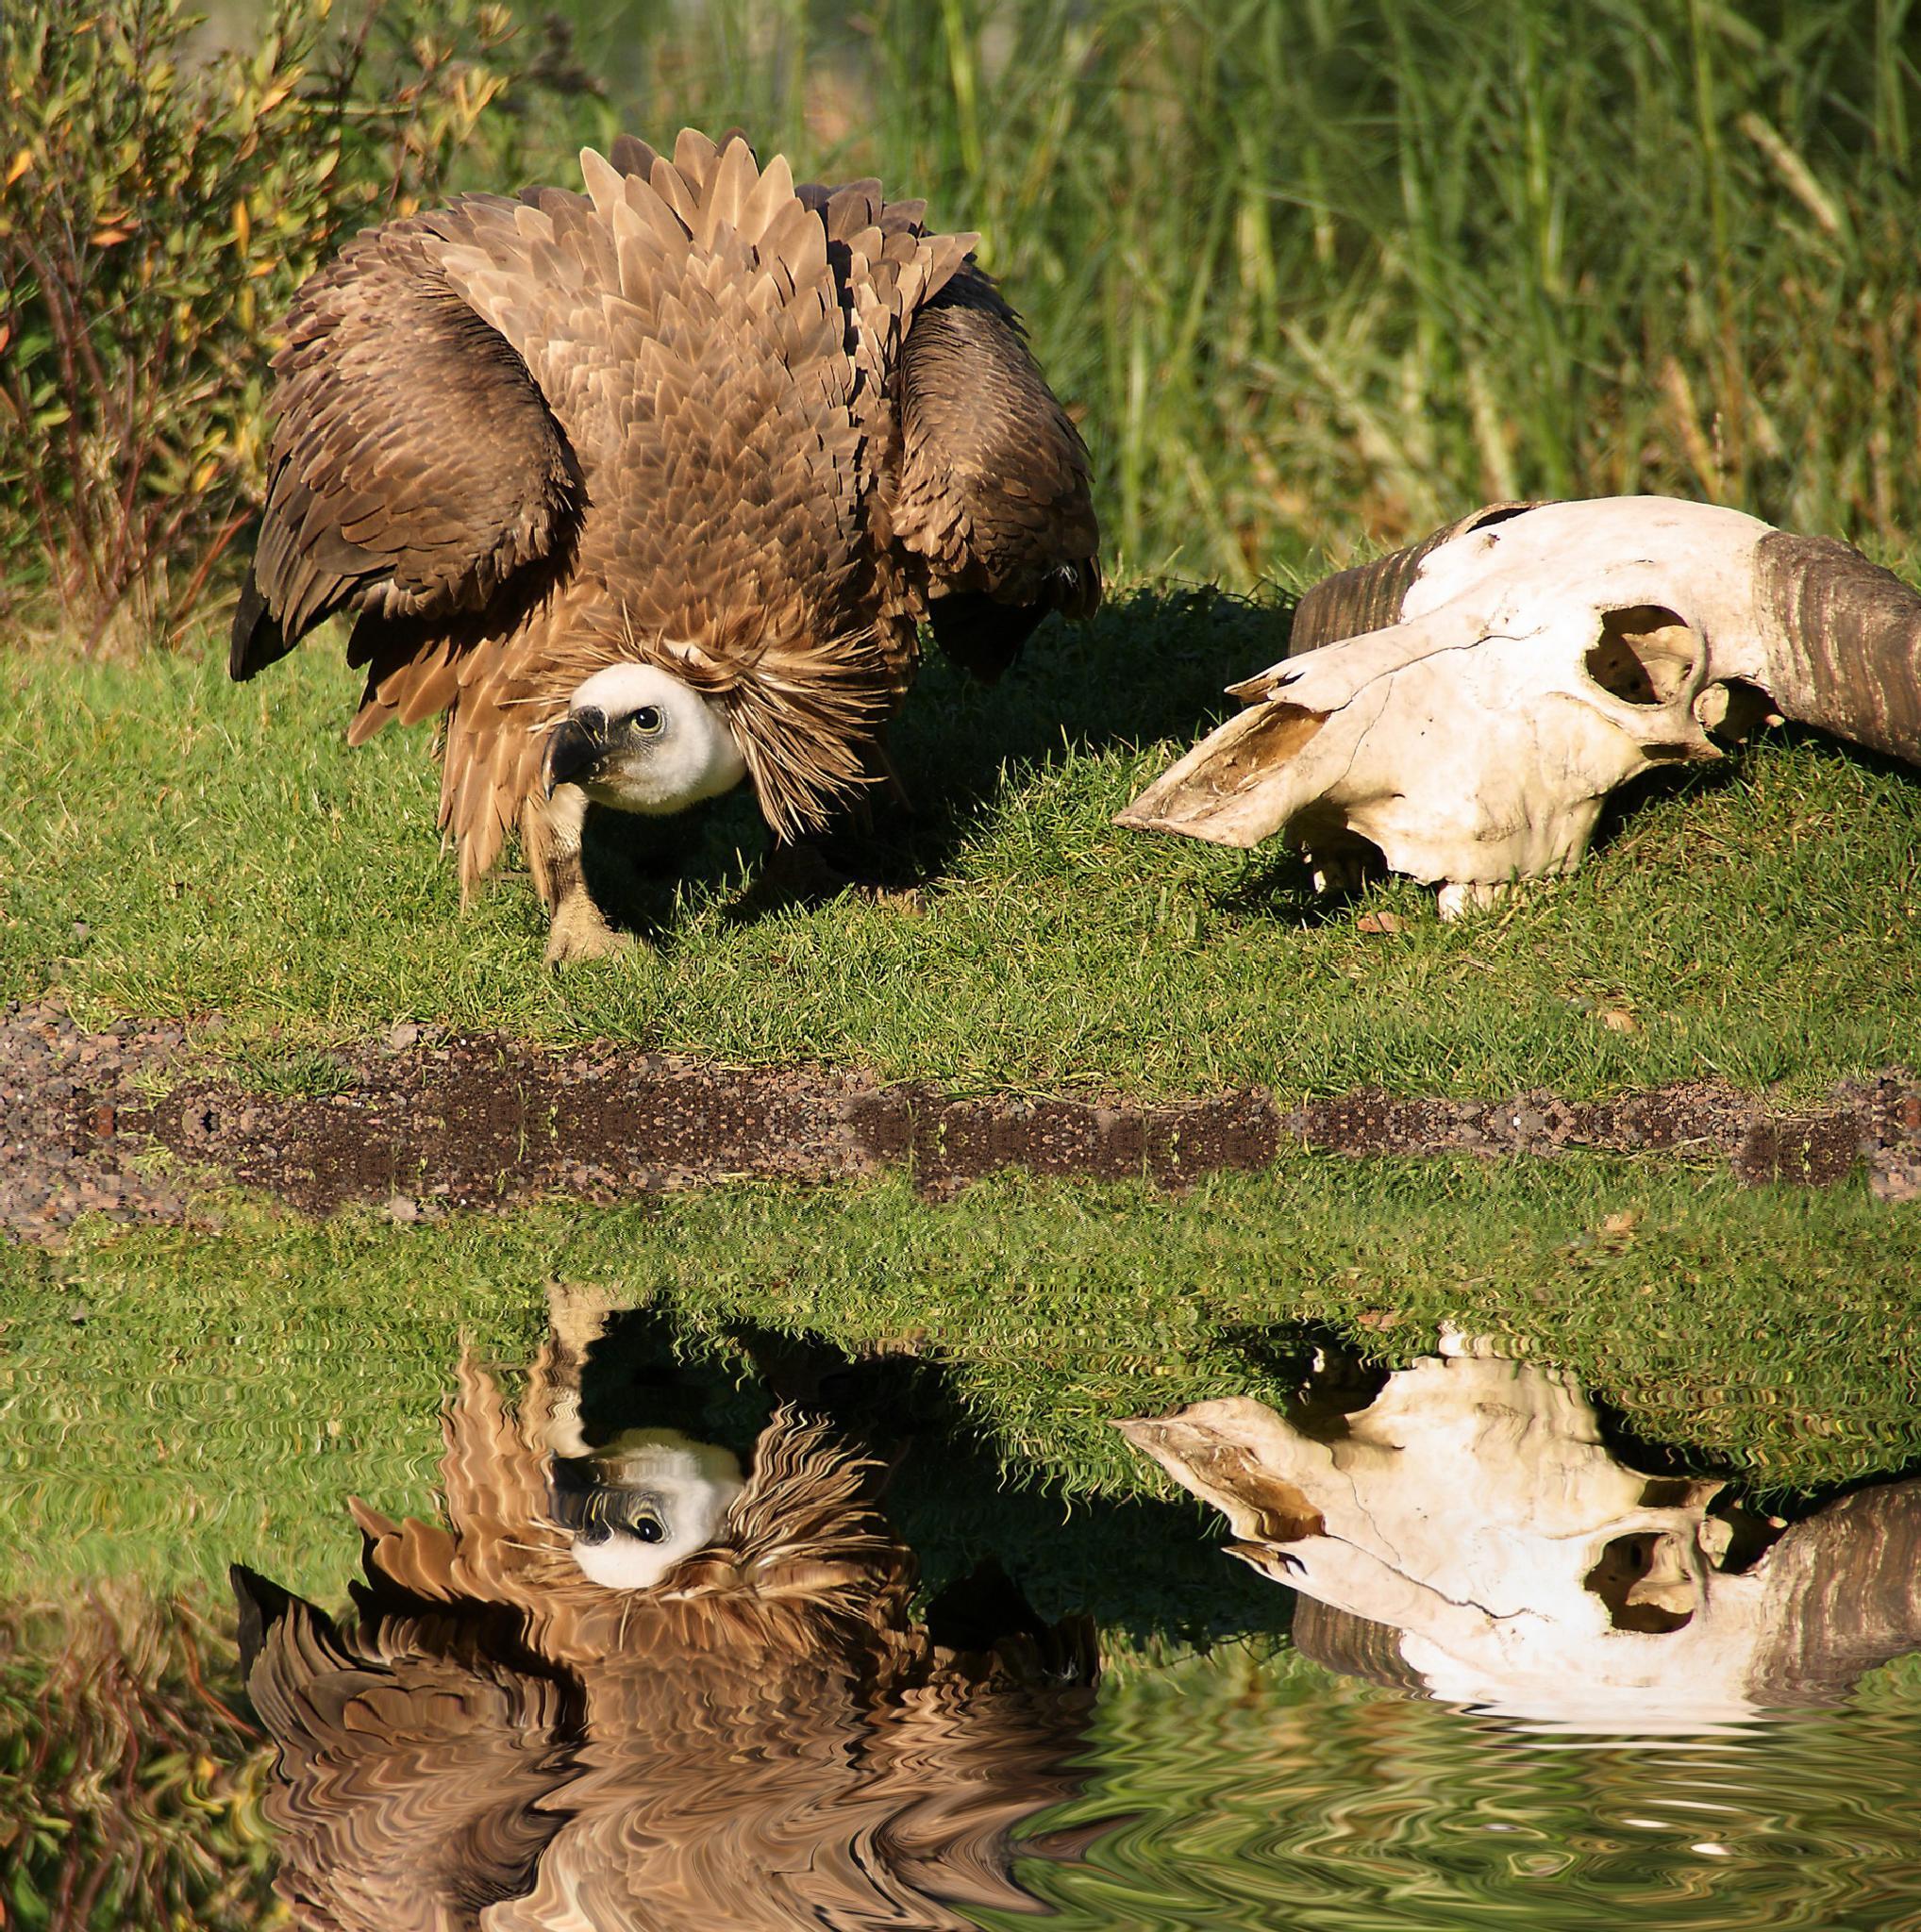 Vulture by Ad Spruijt